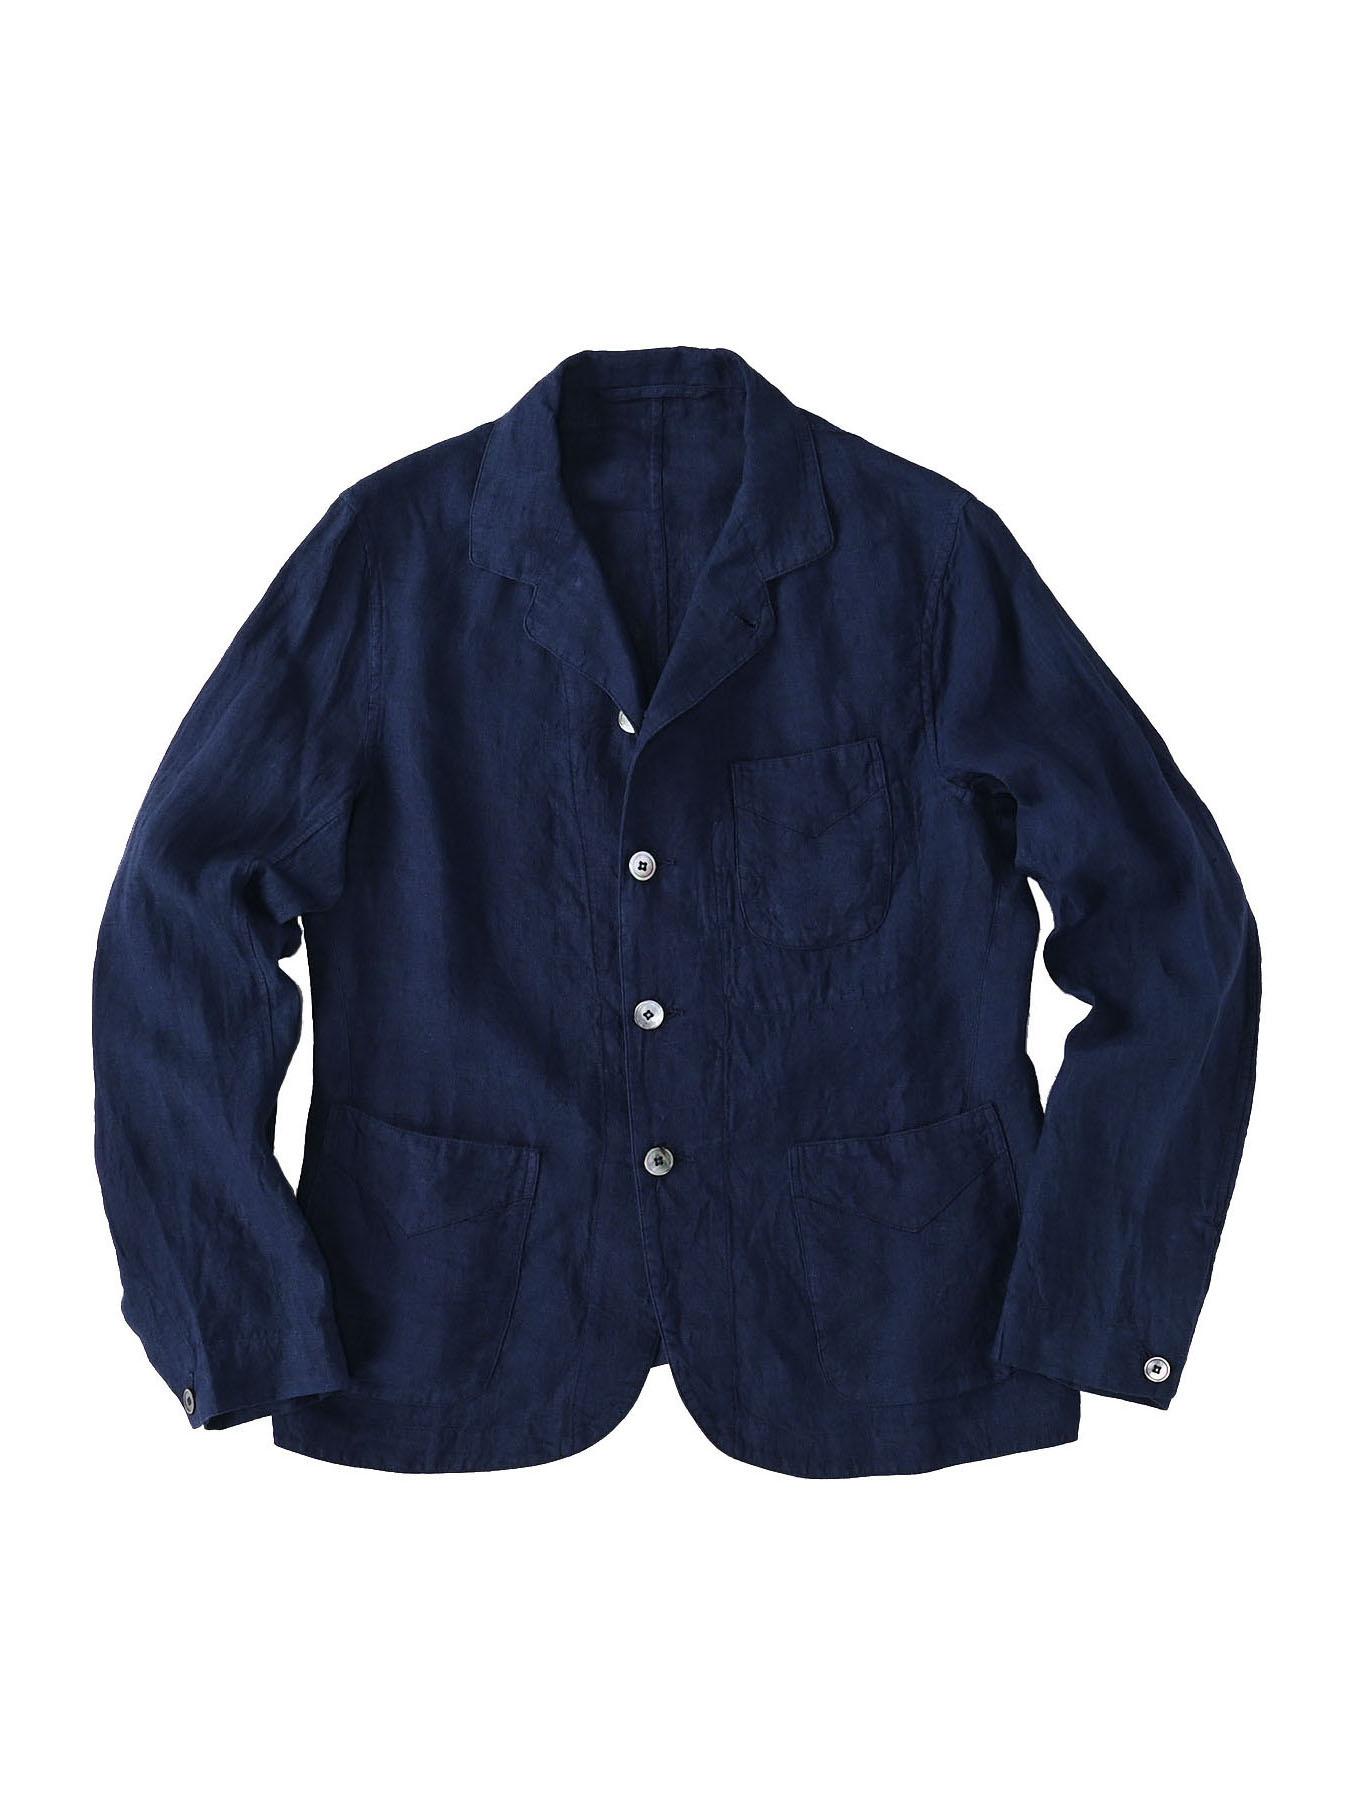 Indigo Indian Linen Flat Shirt Jacket (0521)-1